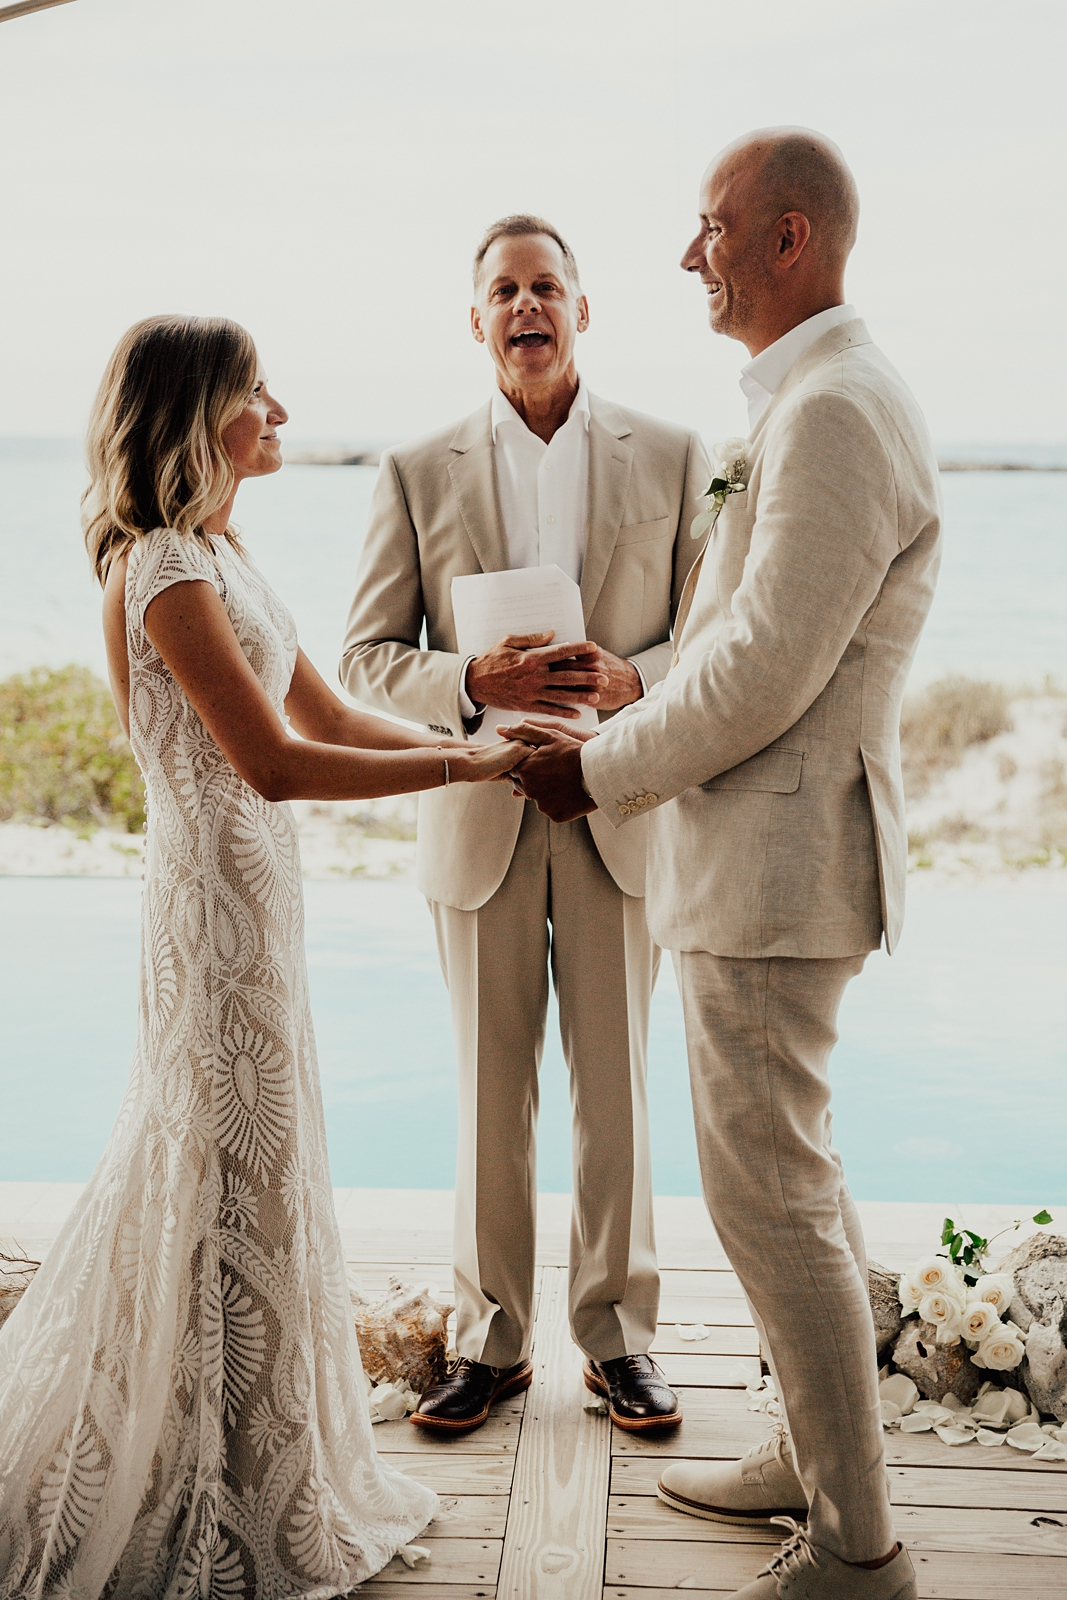 Jenni & Andrew Intimate Beach Destination Wedding in Little Exuma, Bahamas_0508.jpg